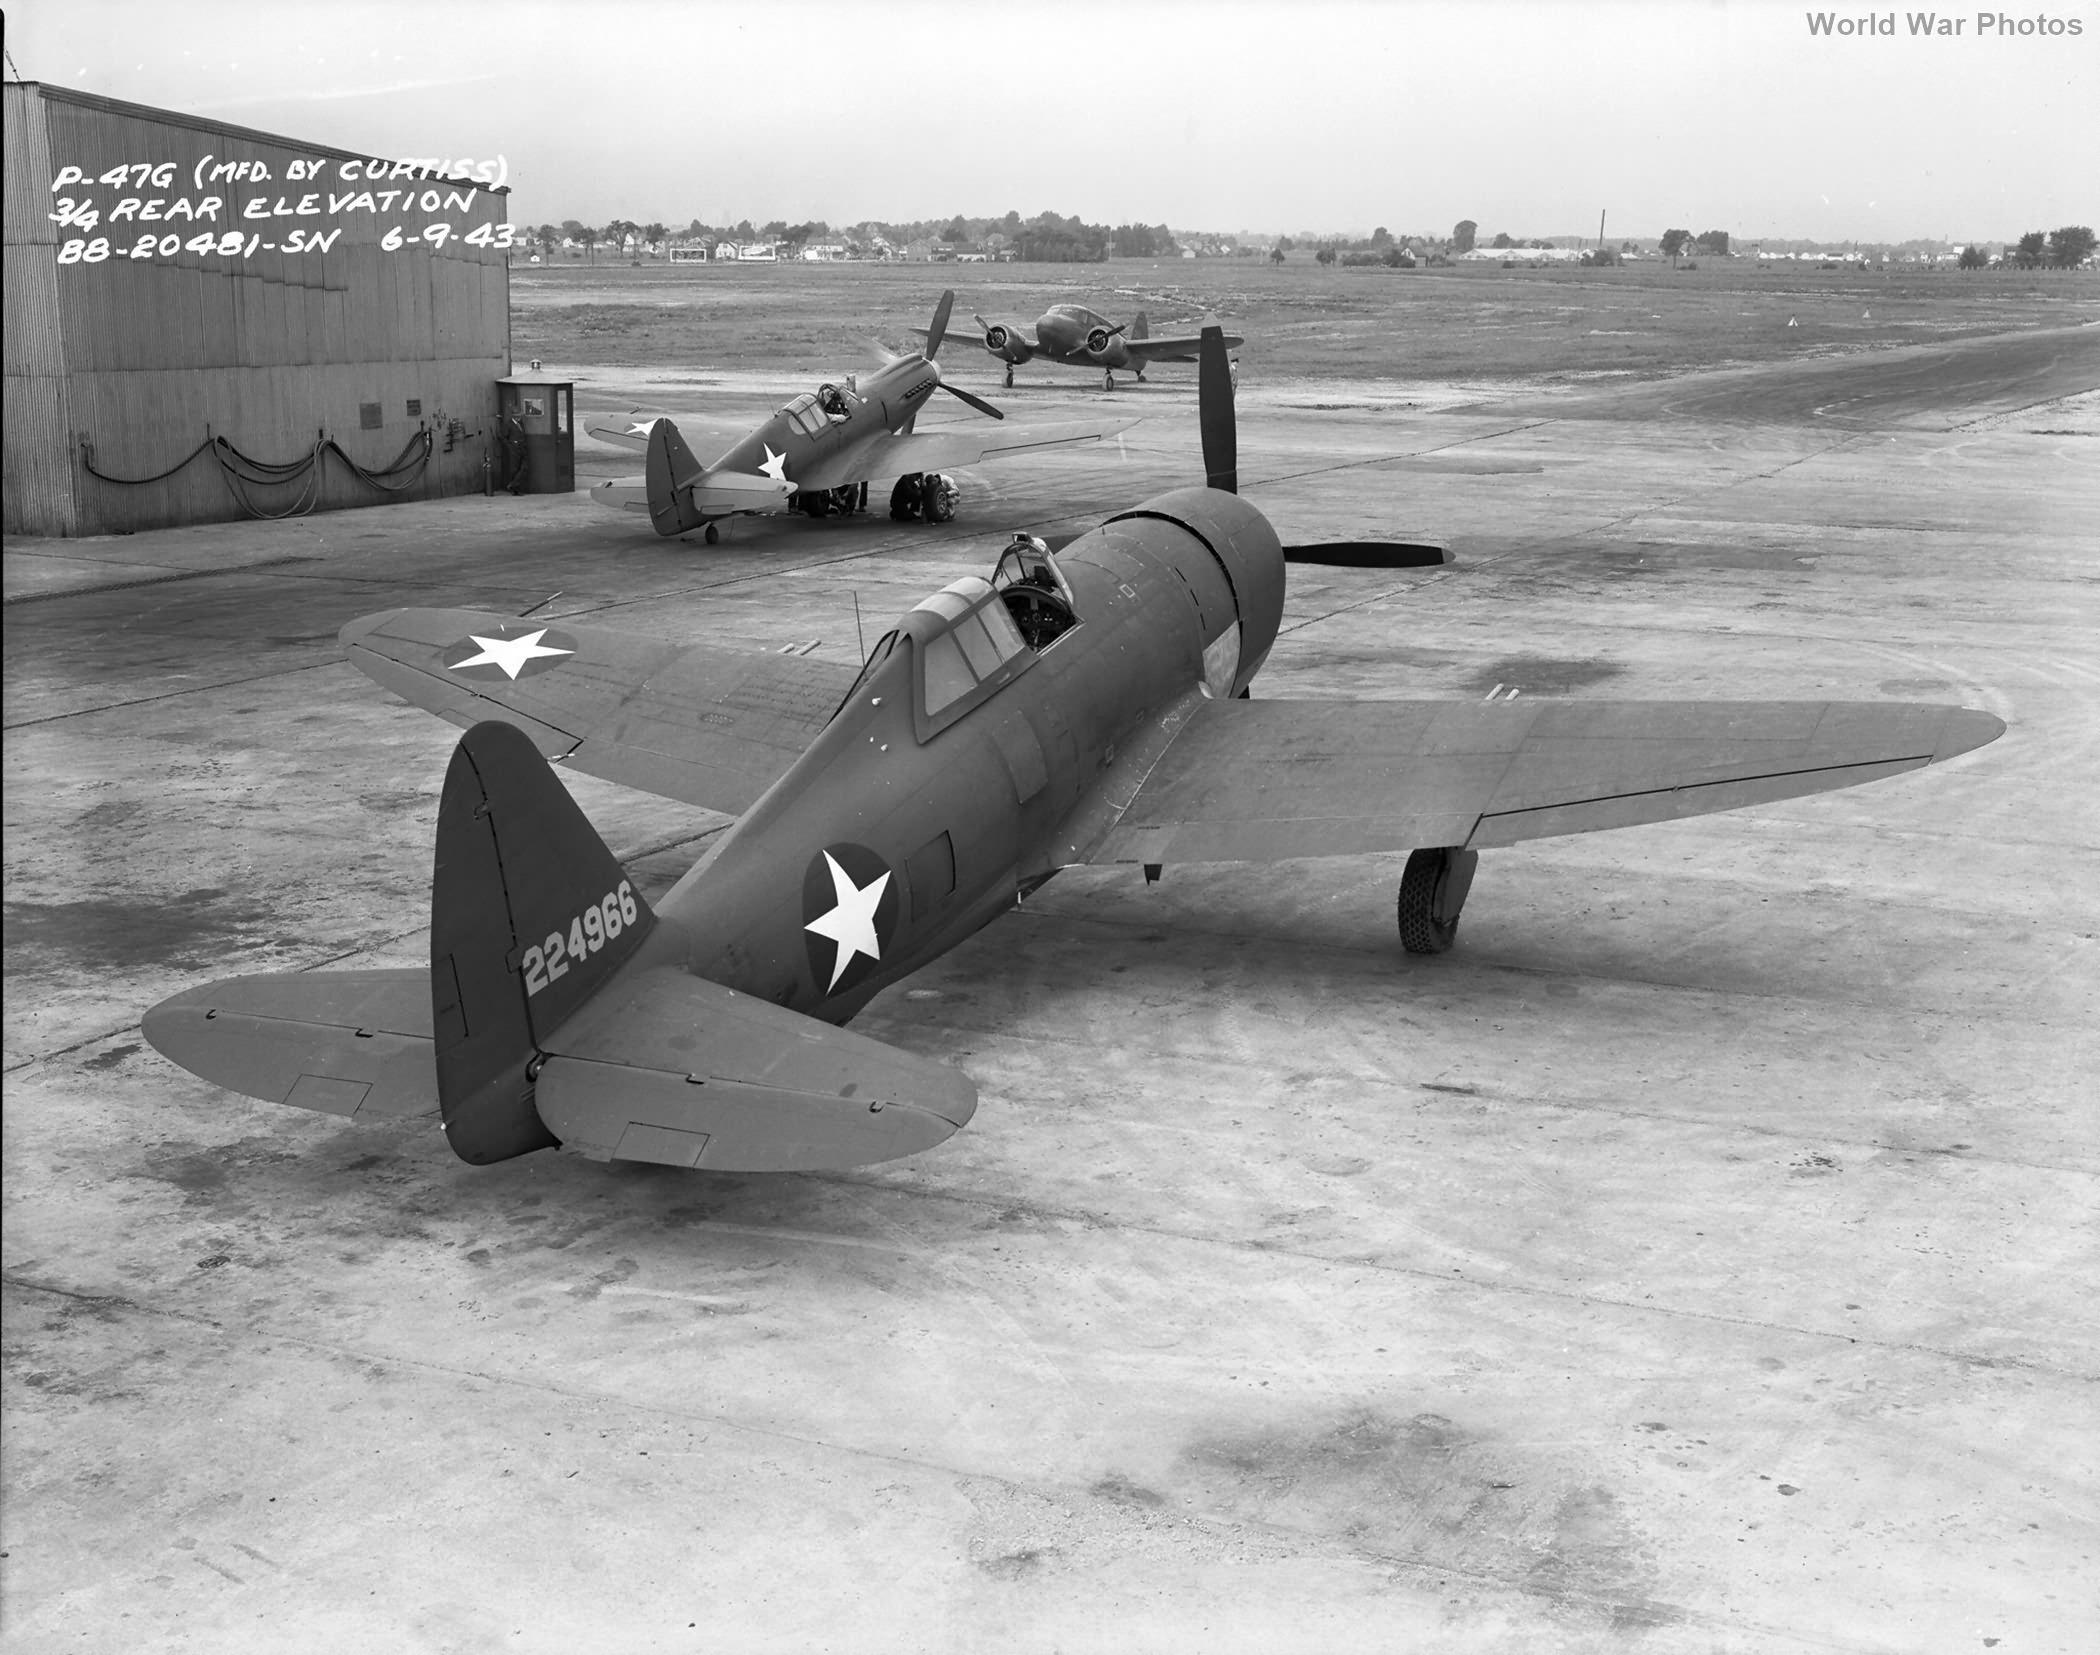 P-47G P-40 Cessna Bamboo Bomber